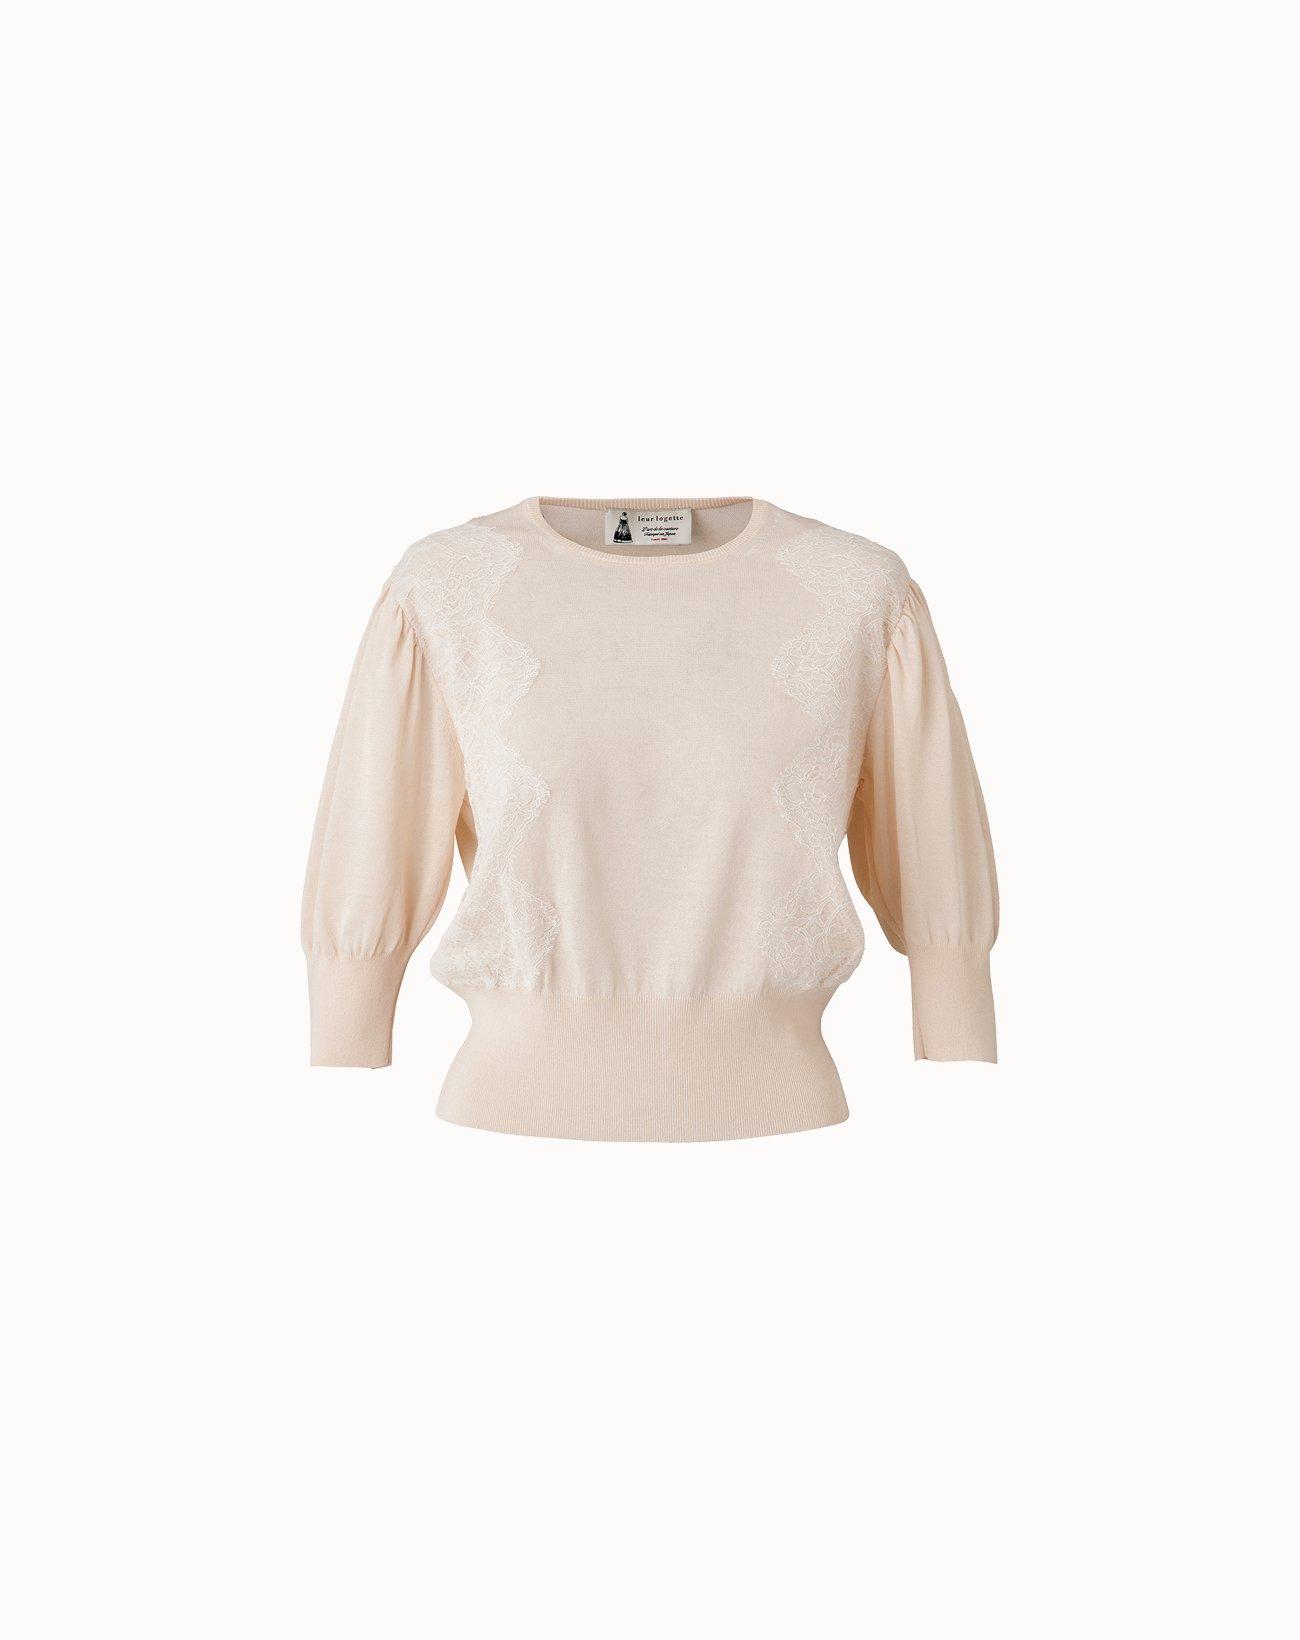 leur logette - Cotton Silk Top - Off White